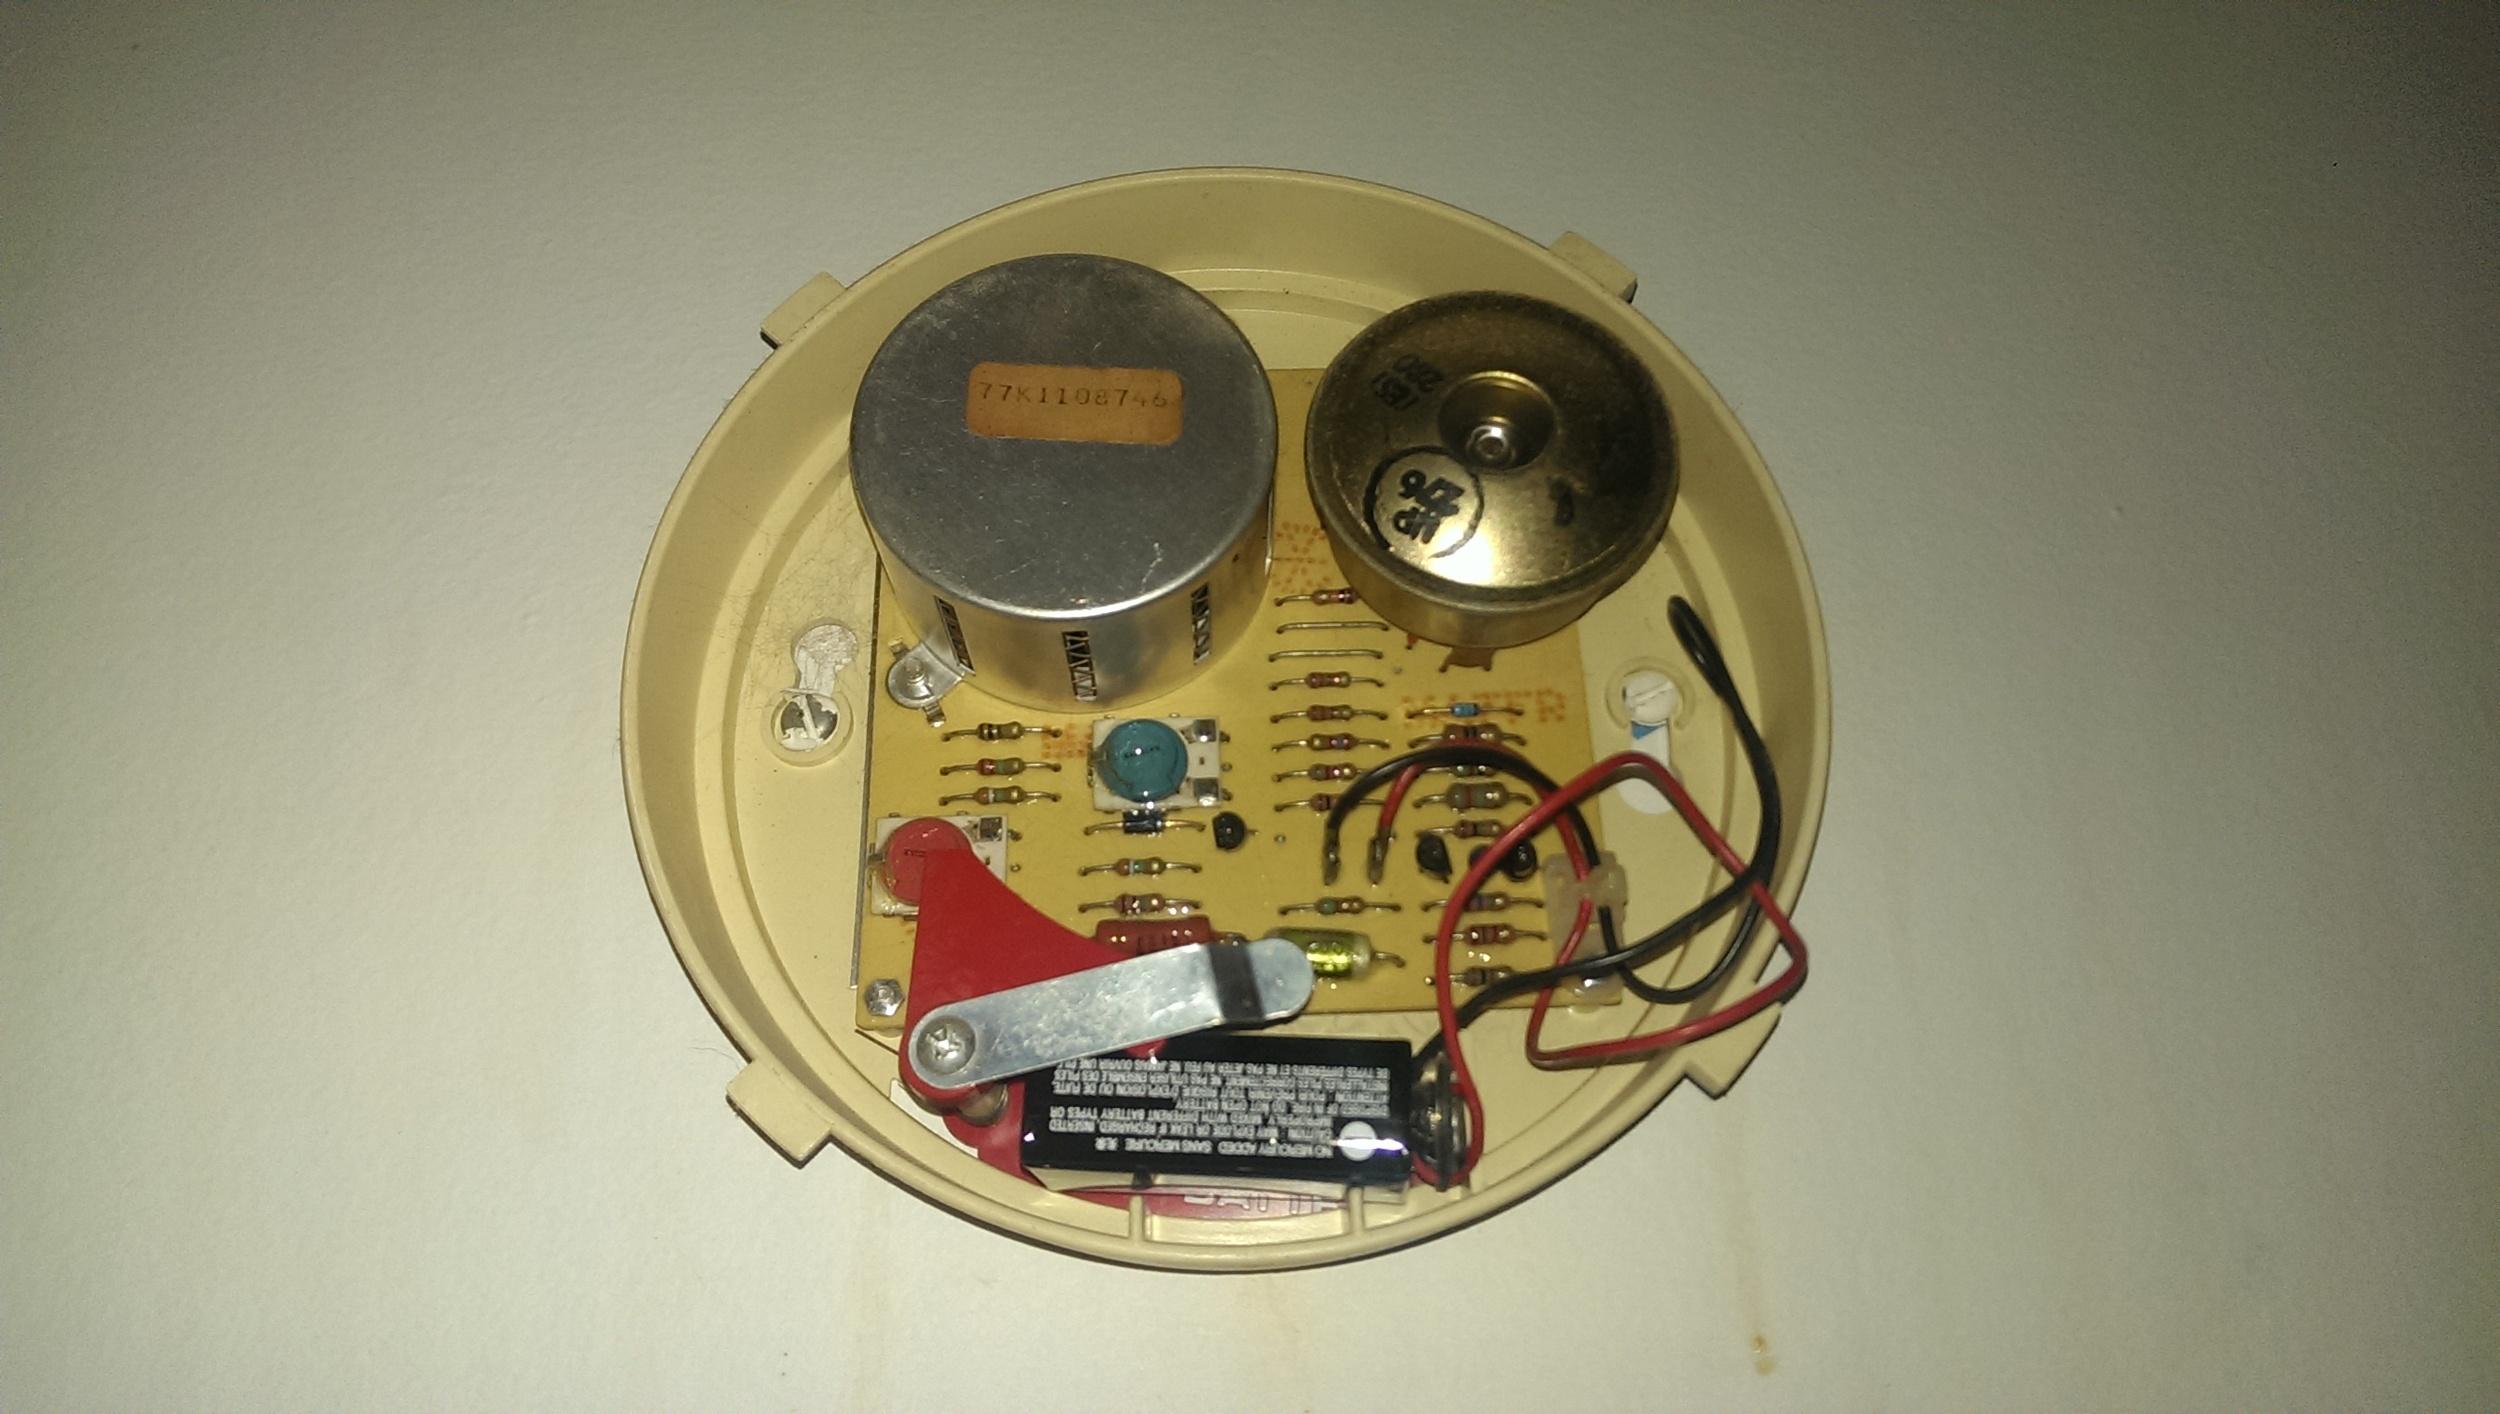 old-smoke-alarm-detector-photo.jpg